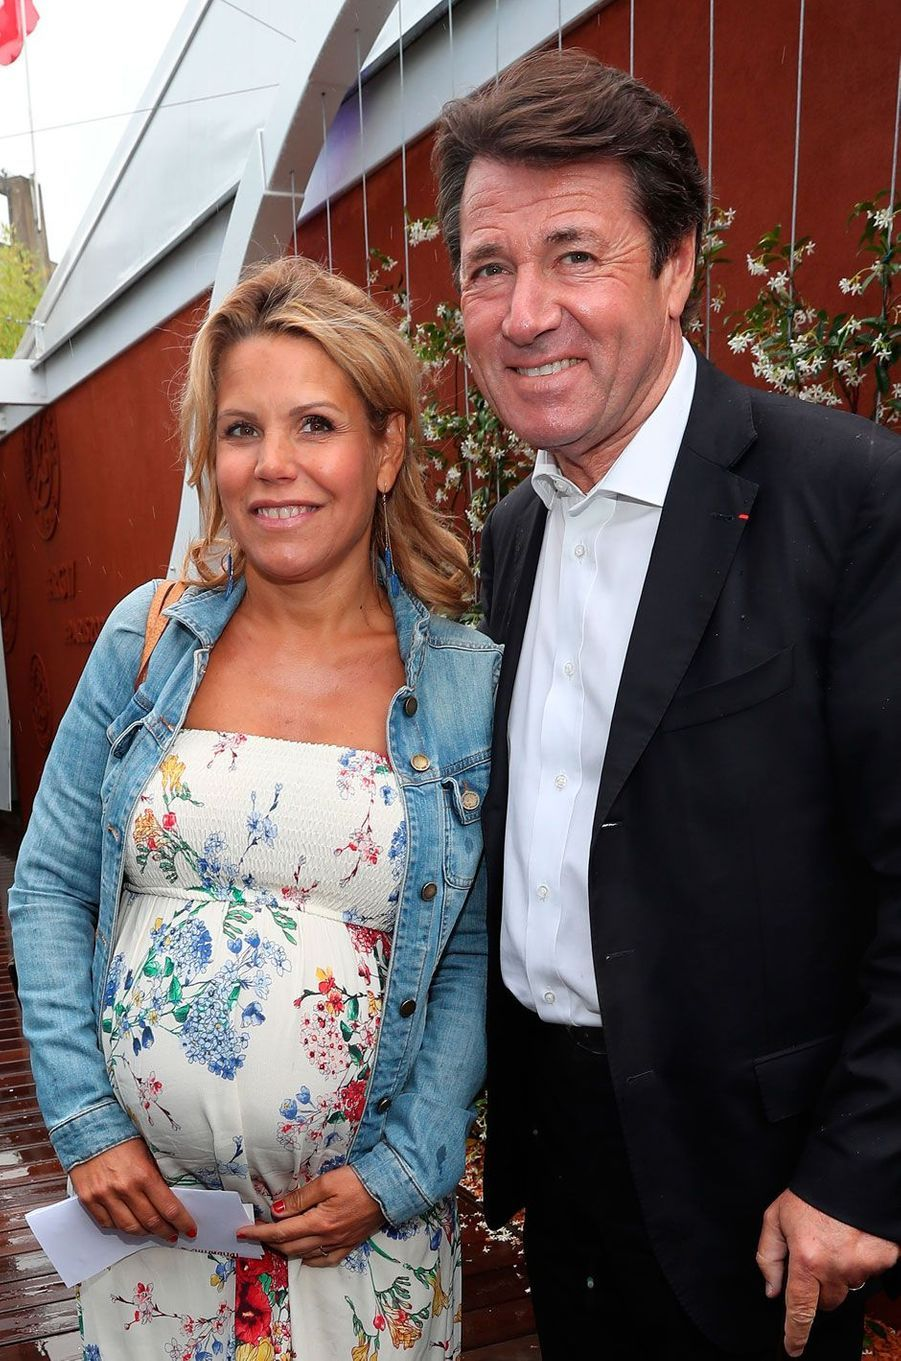 Laura Tenoudji et son compagnon Christian Estrosi